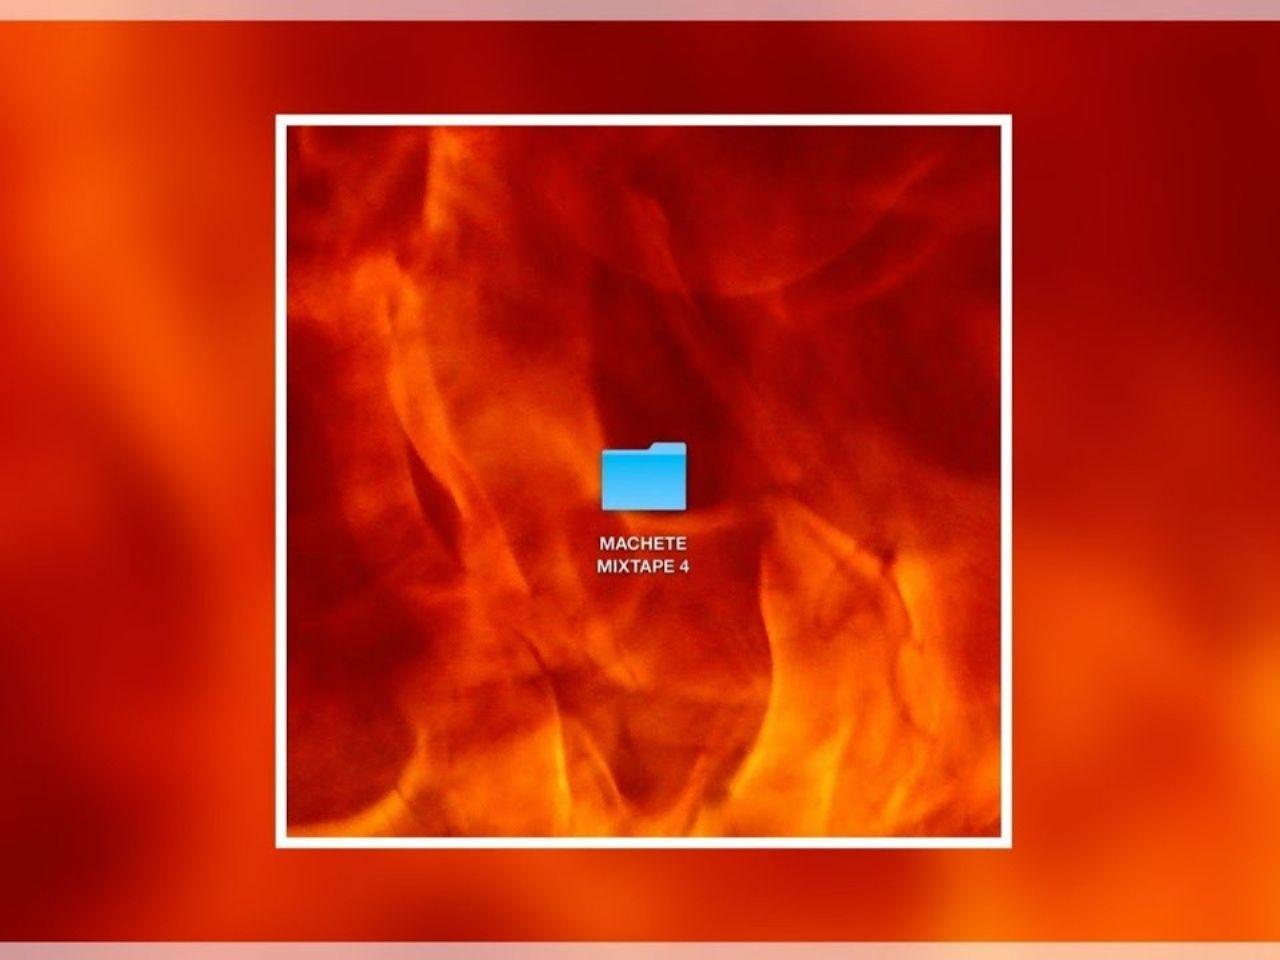 Machete Mixtape 4, la saga continua - Radio Bicocca